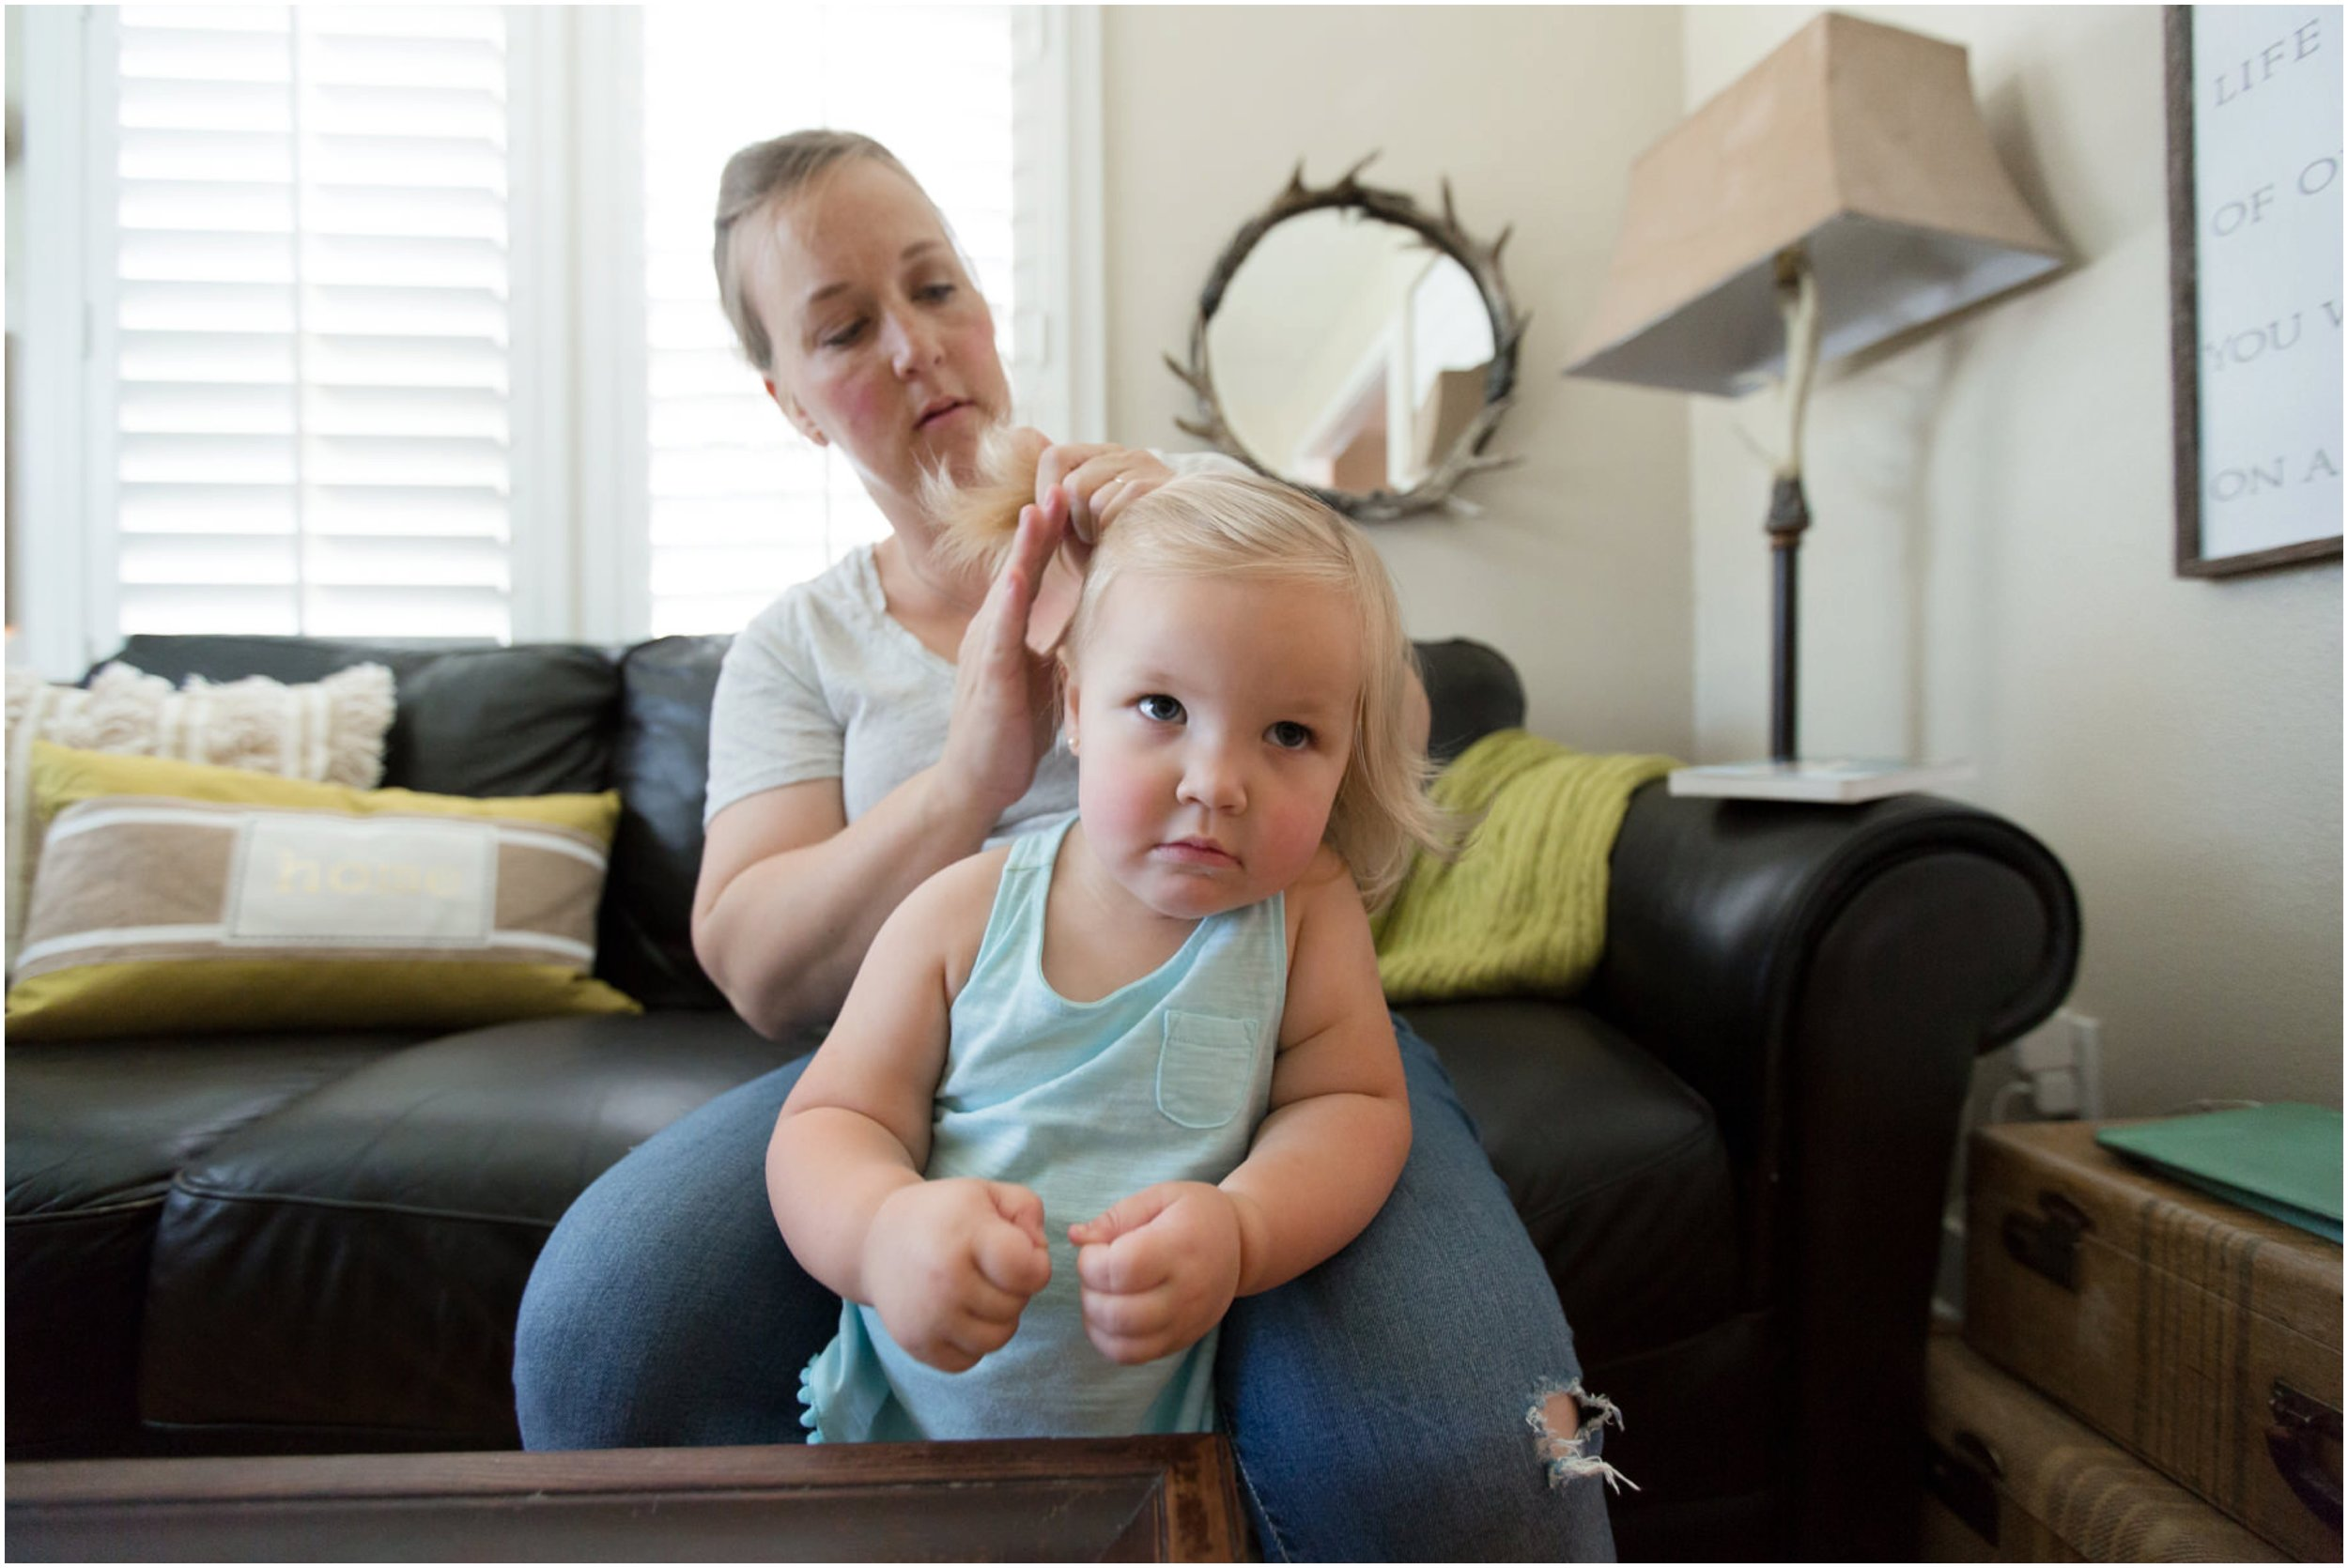 oklahoma_documentary_photos_at_home_family_toddler_fun